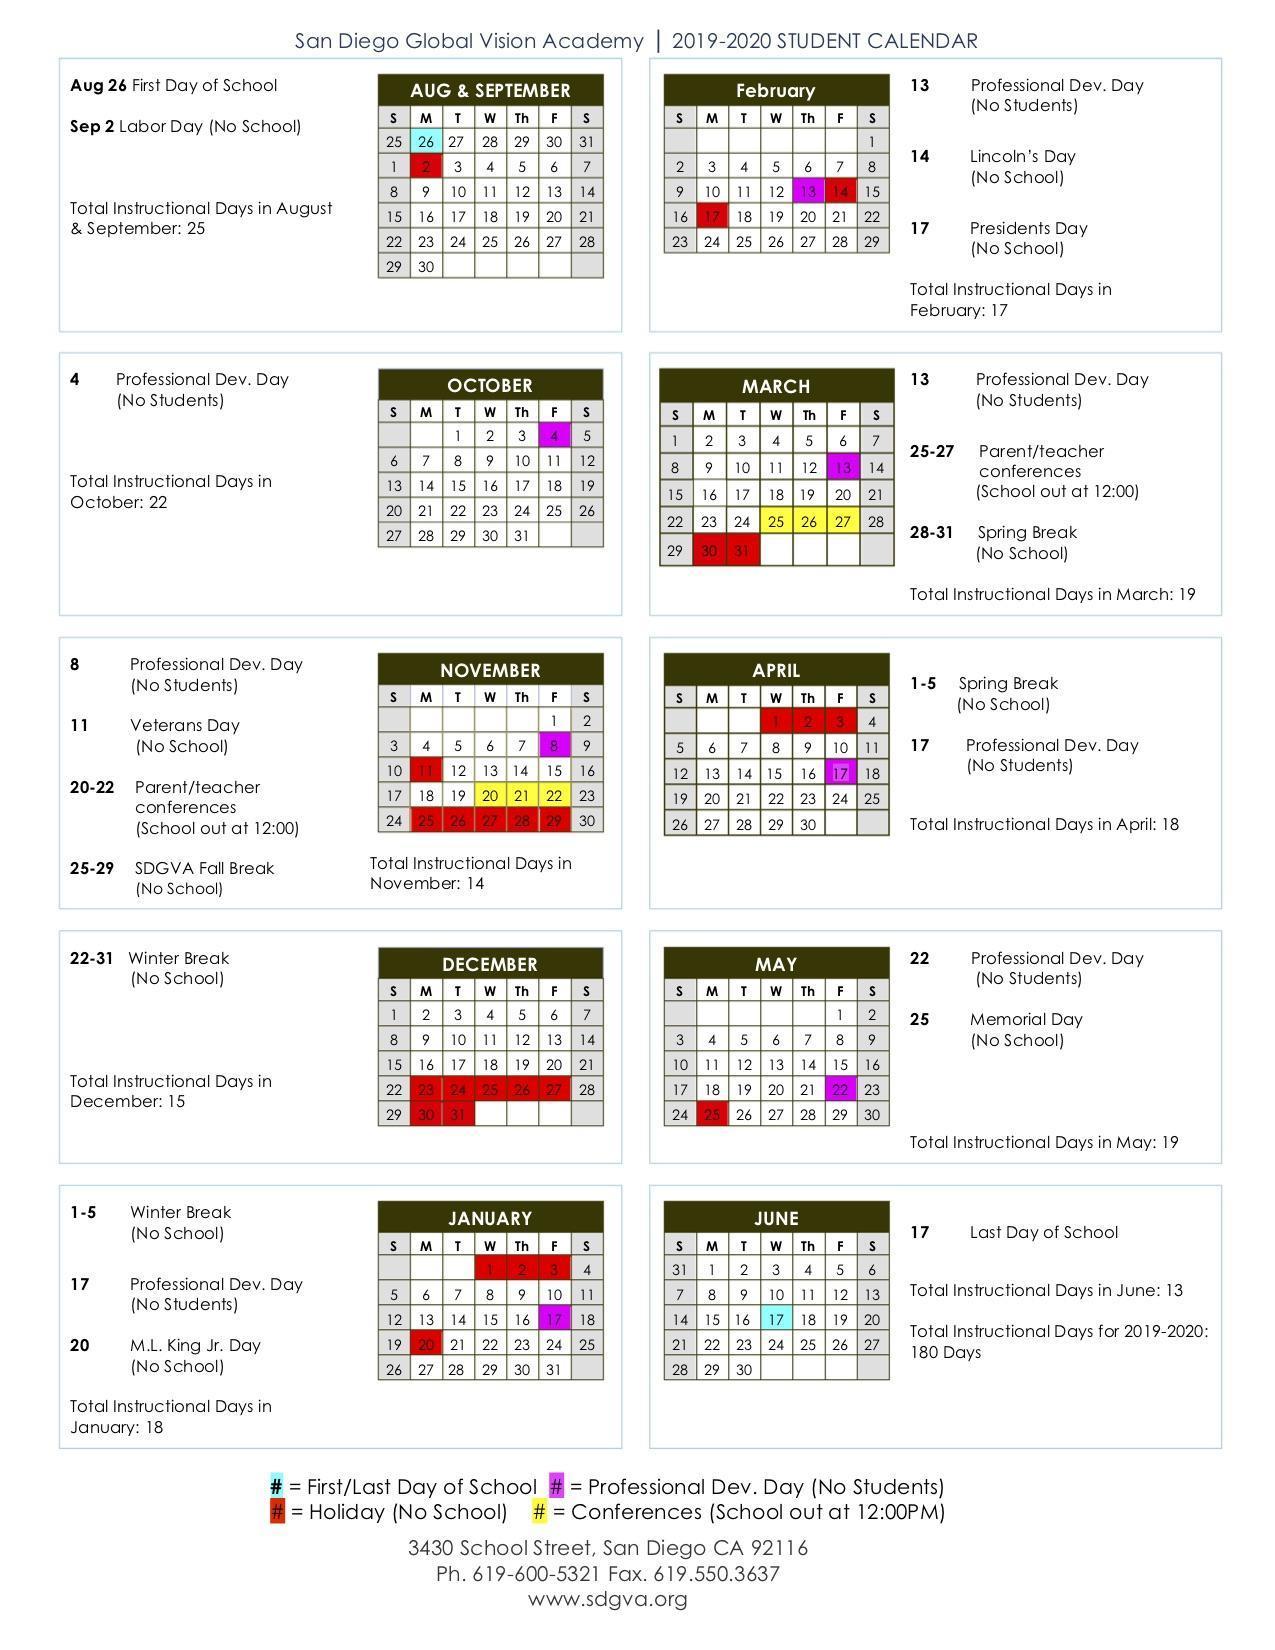 ucsd academic calendar 2020